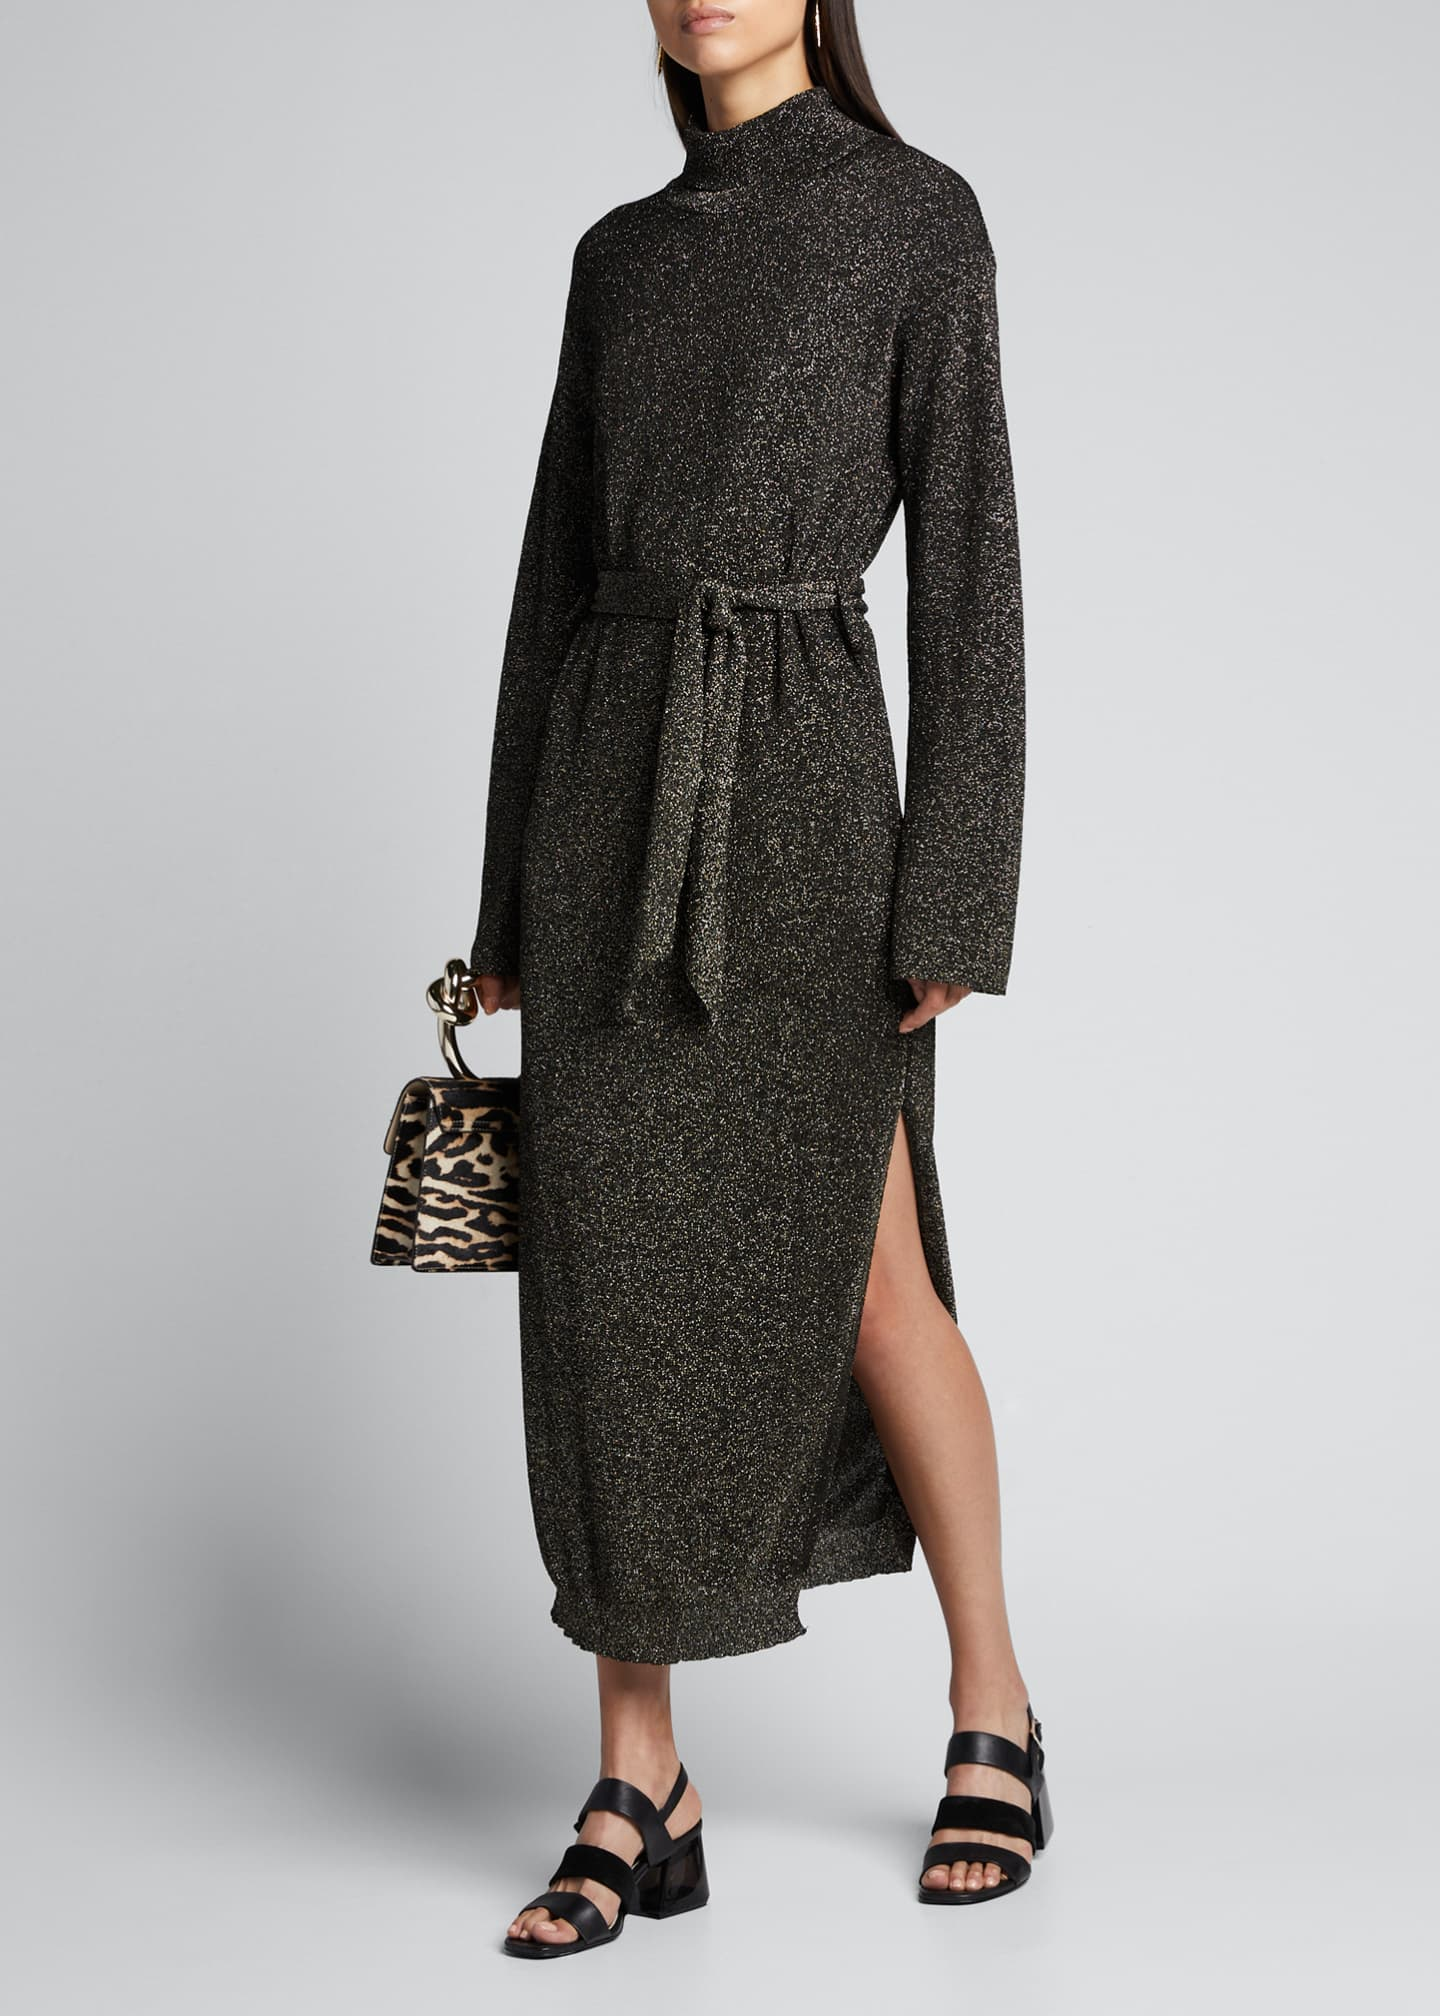 Nanushka Canaan Metallic Mock-Neck Long Sweater Dress